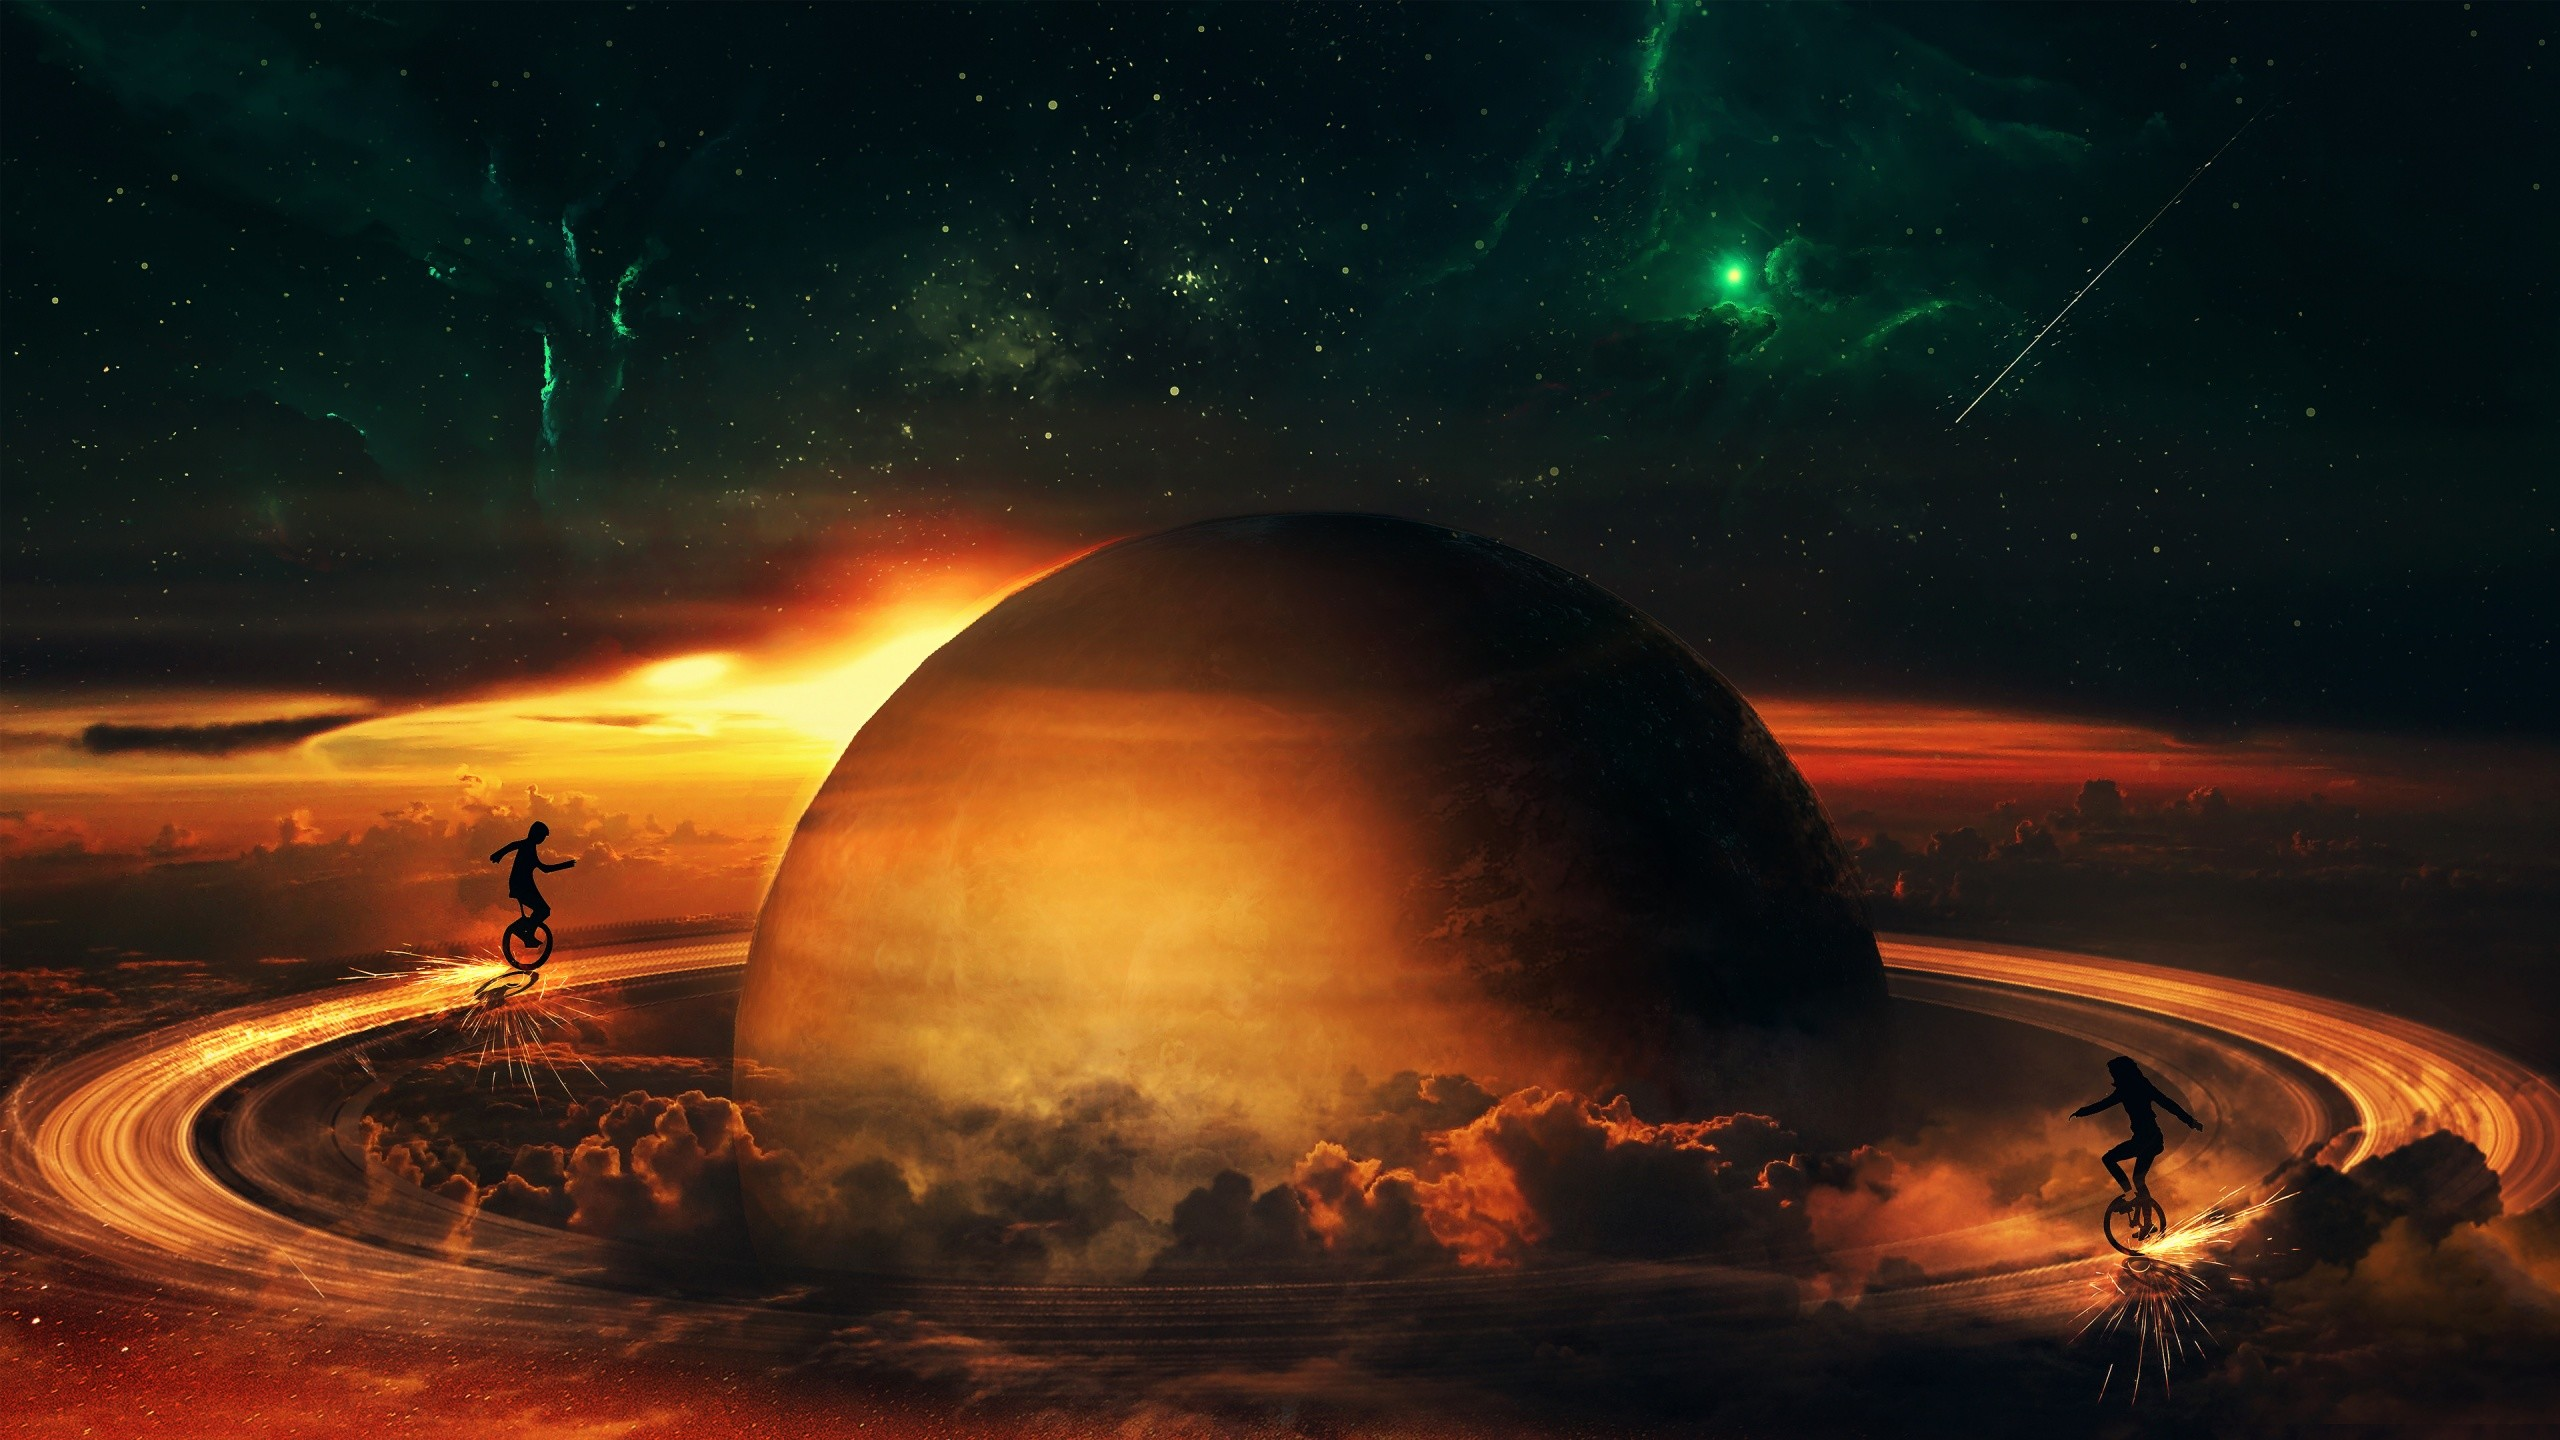 Fantasy Space Sci-Fi Art Wallpaper, free computer desktop hd wallpapers,  pictures,